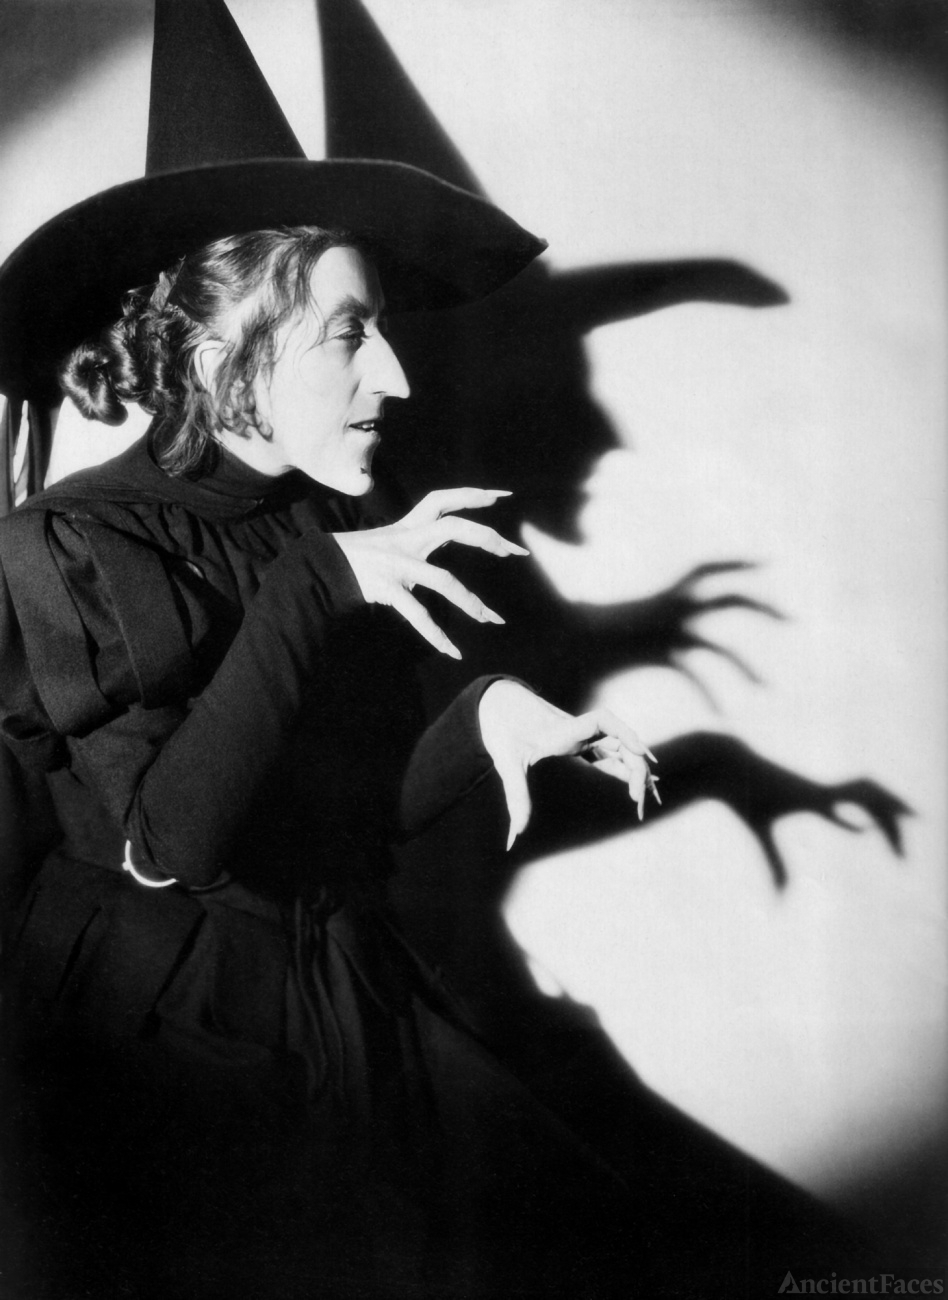 Witch in Wizard of Oz - Margaret Hamilton